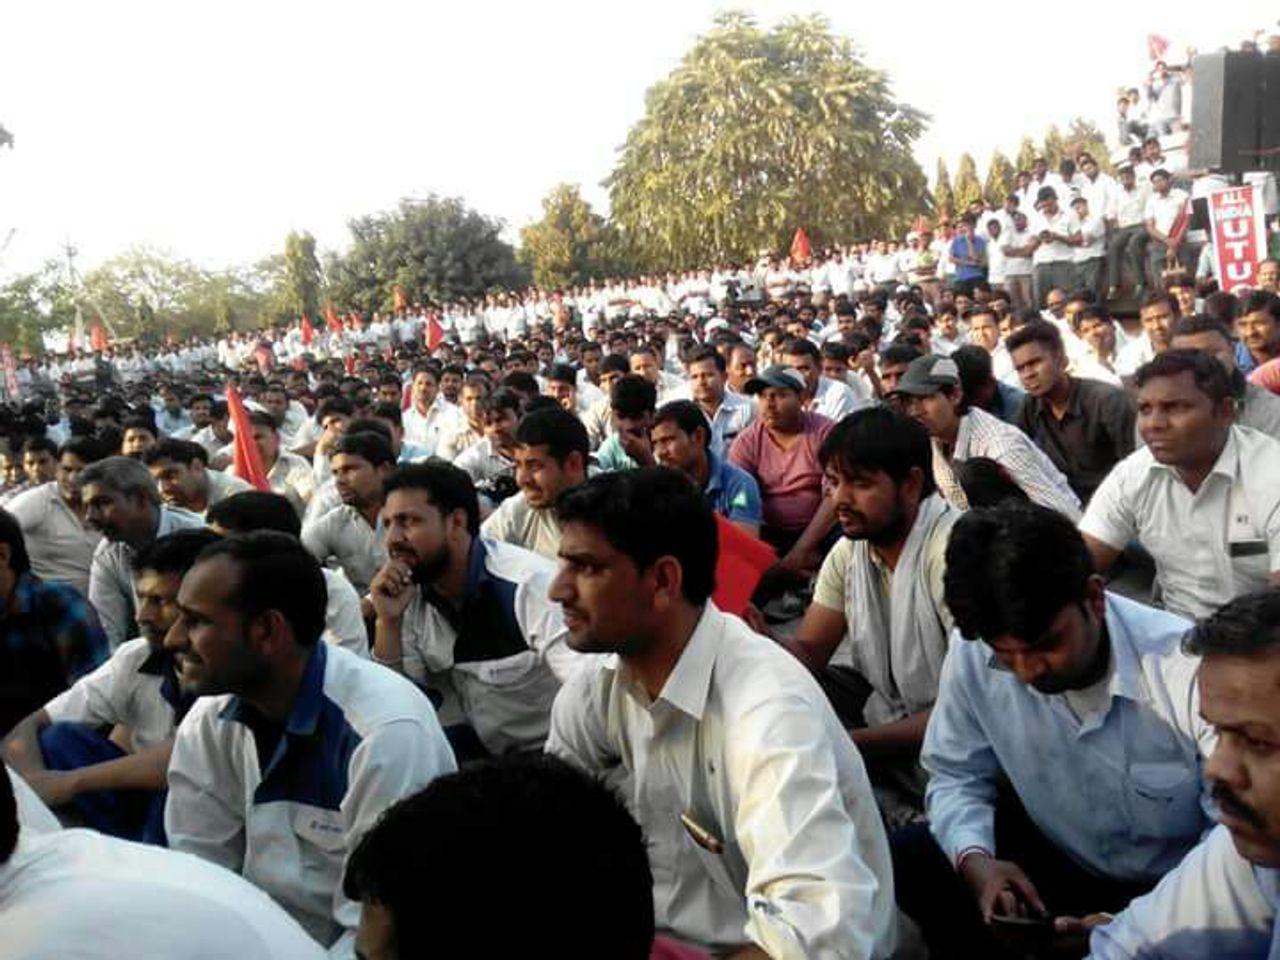 The Manesar rally